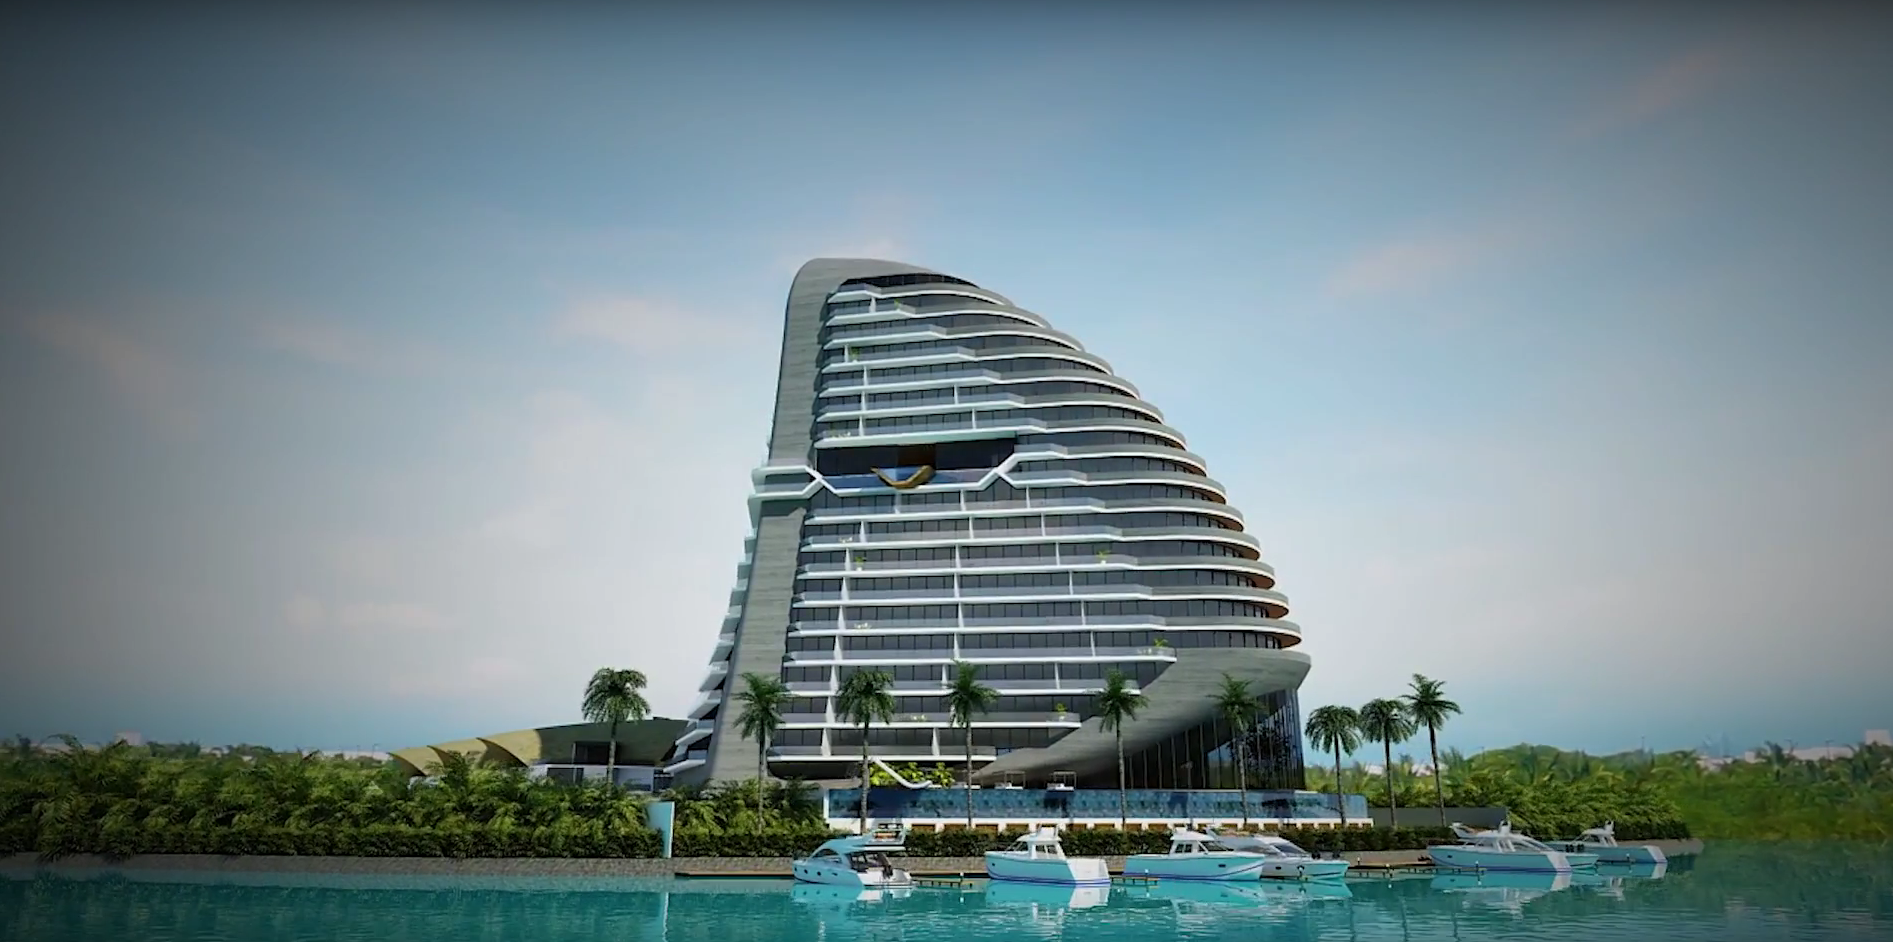 Shark Tower, Puerto Cancún, Q. Roo